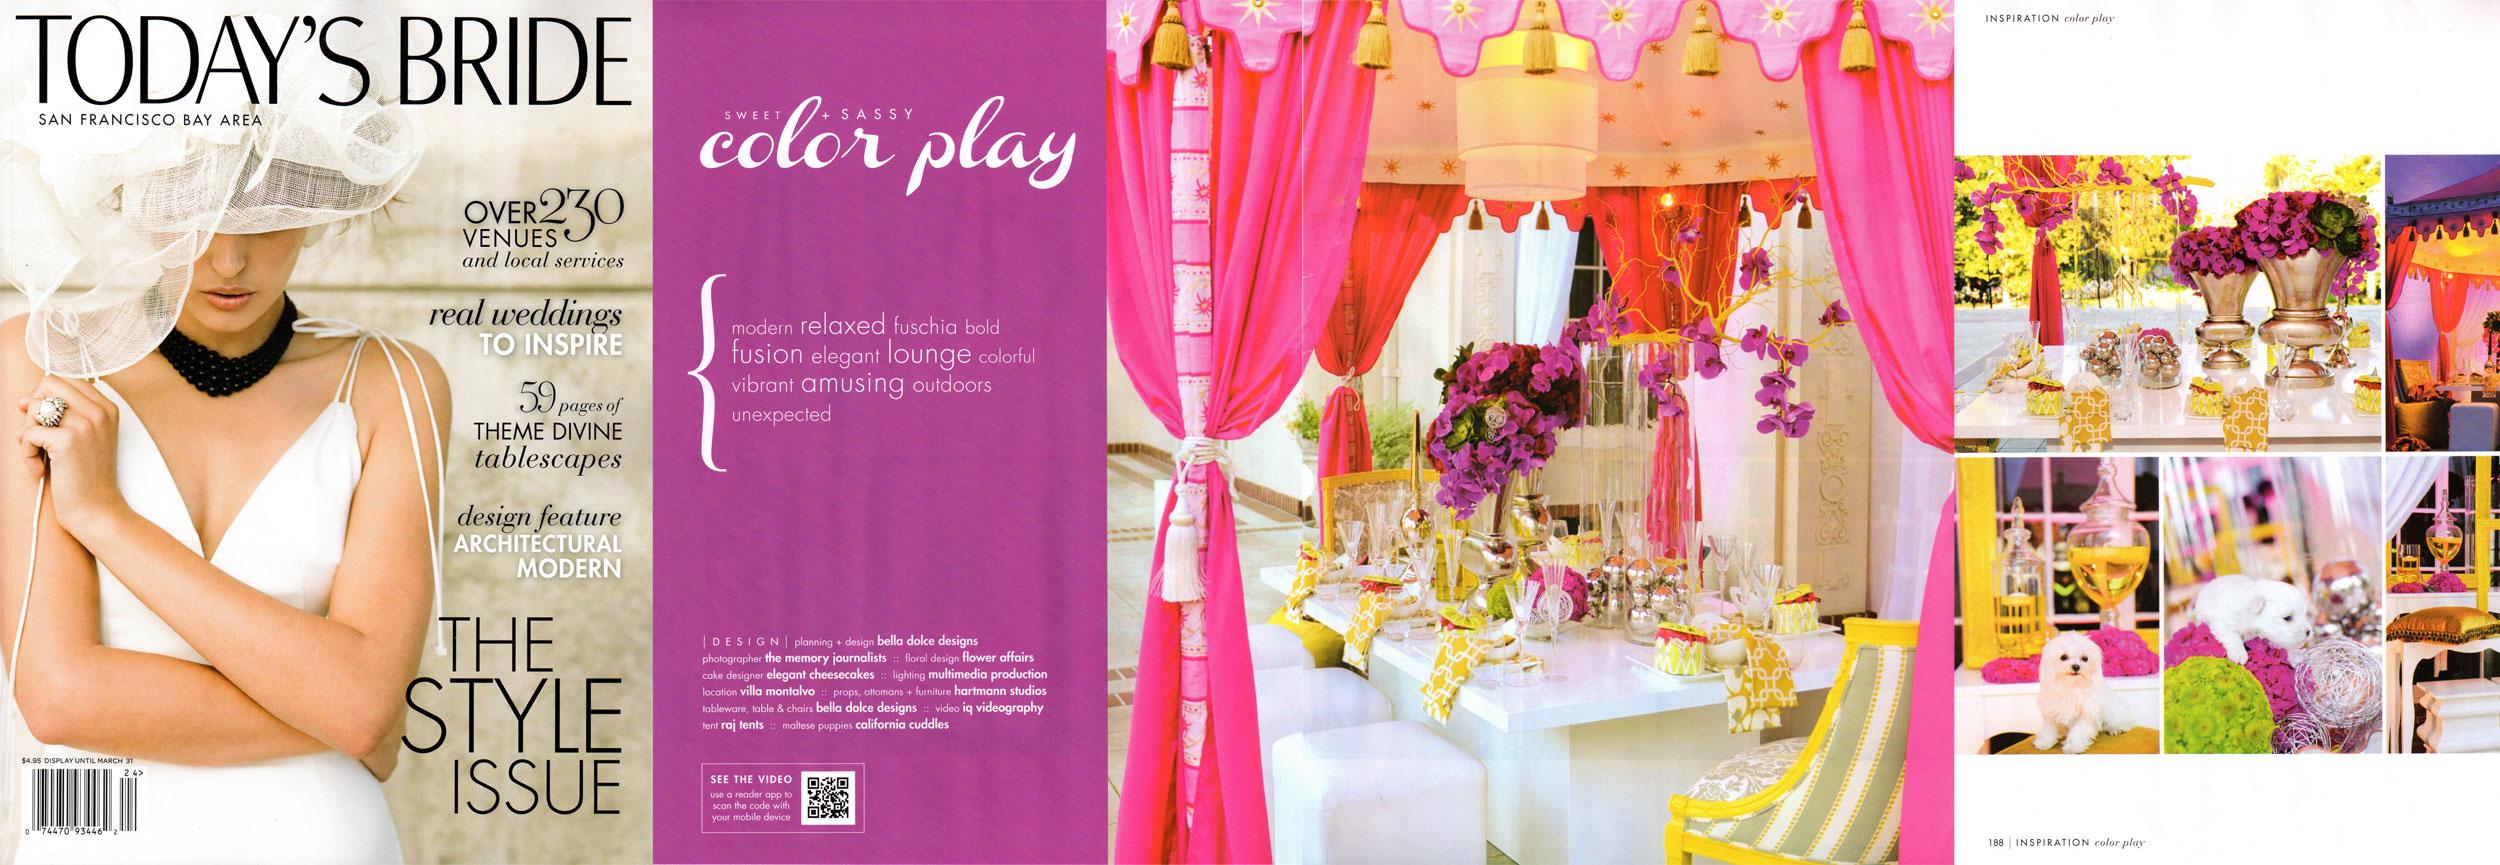 raj-tents-todays-bride-color-play-feature.jpg